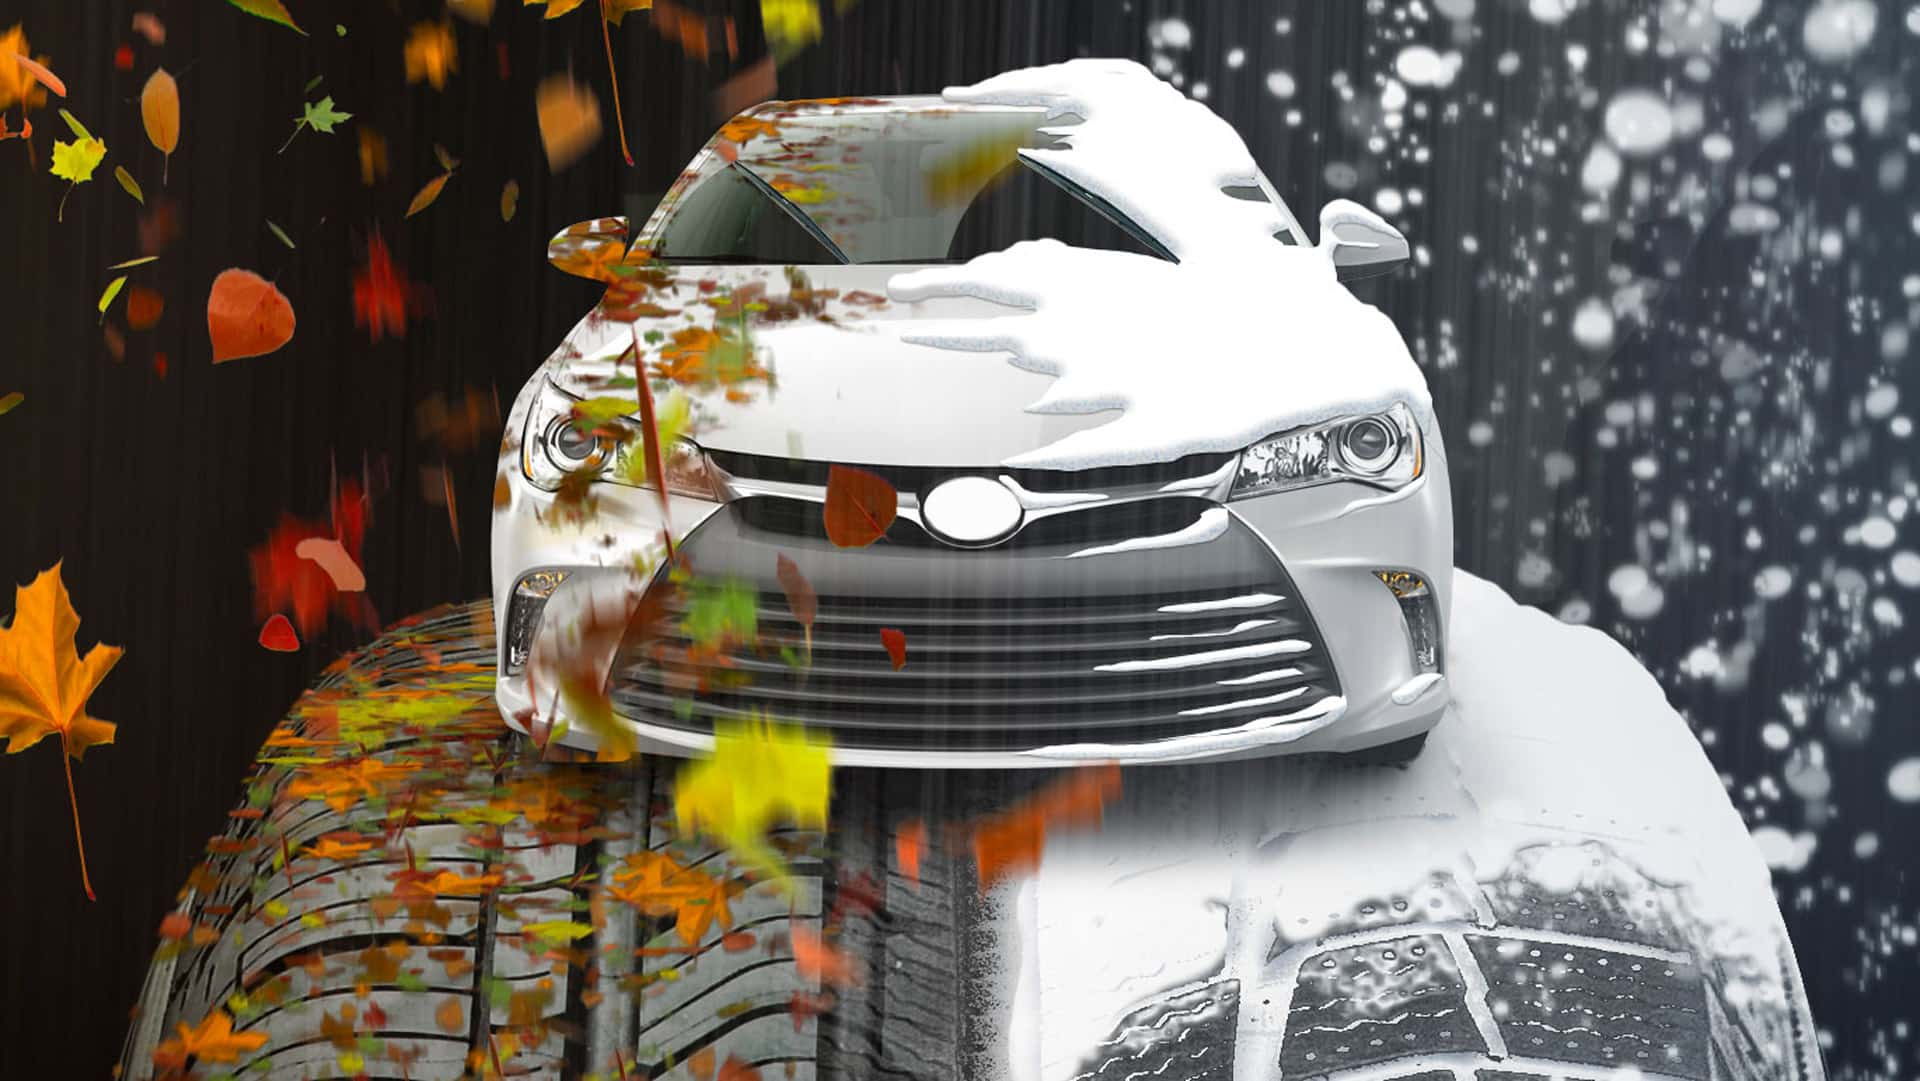 ottawa-tires ottawa-winter-tires ottawa-steel-wheels ottawa-winter-wheels ottawa-winter-car